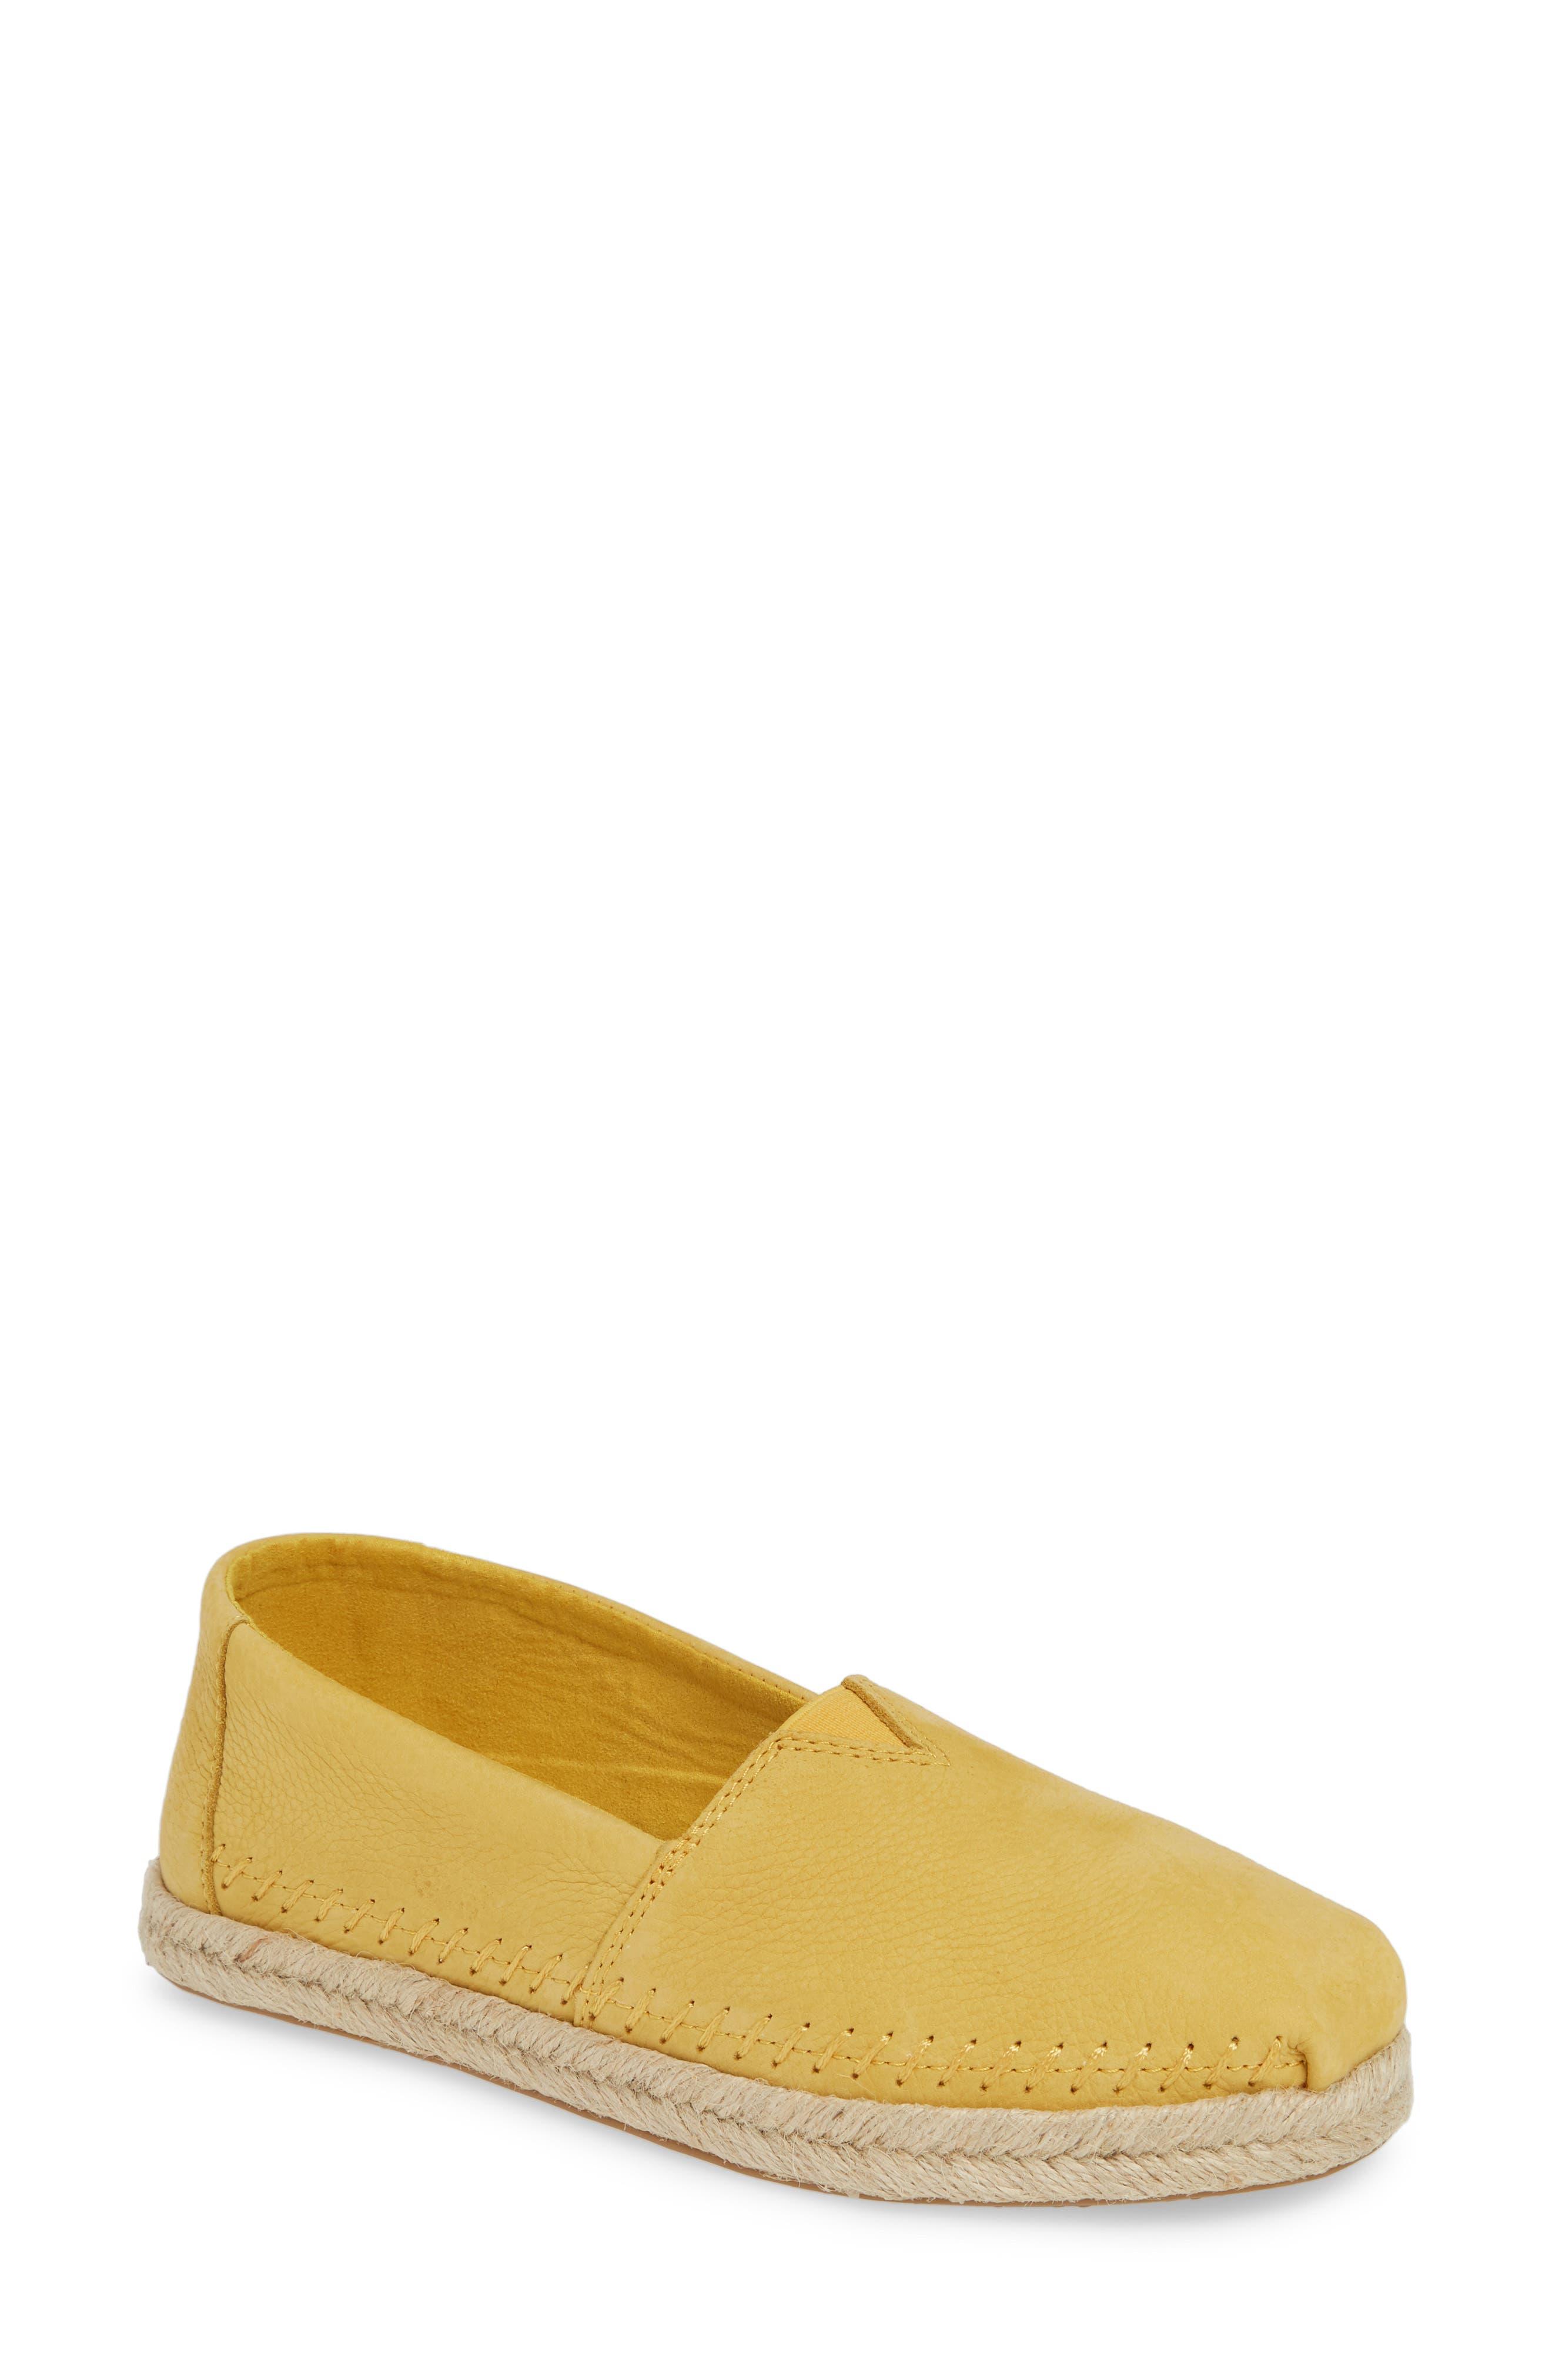 Toms Alpargata Slip-On, Yellow